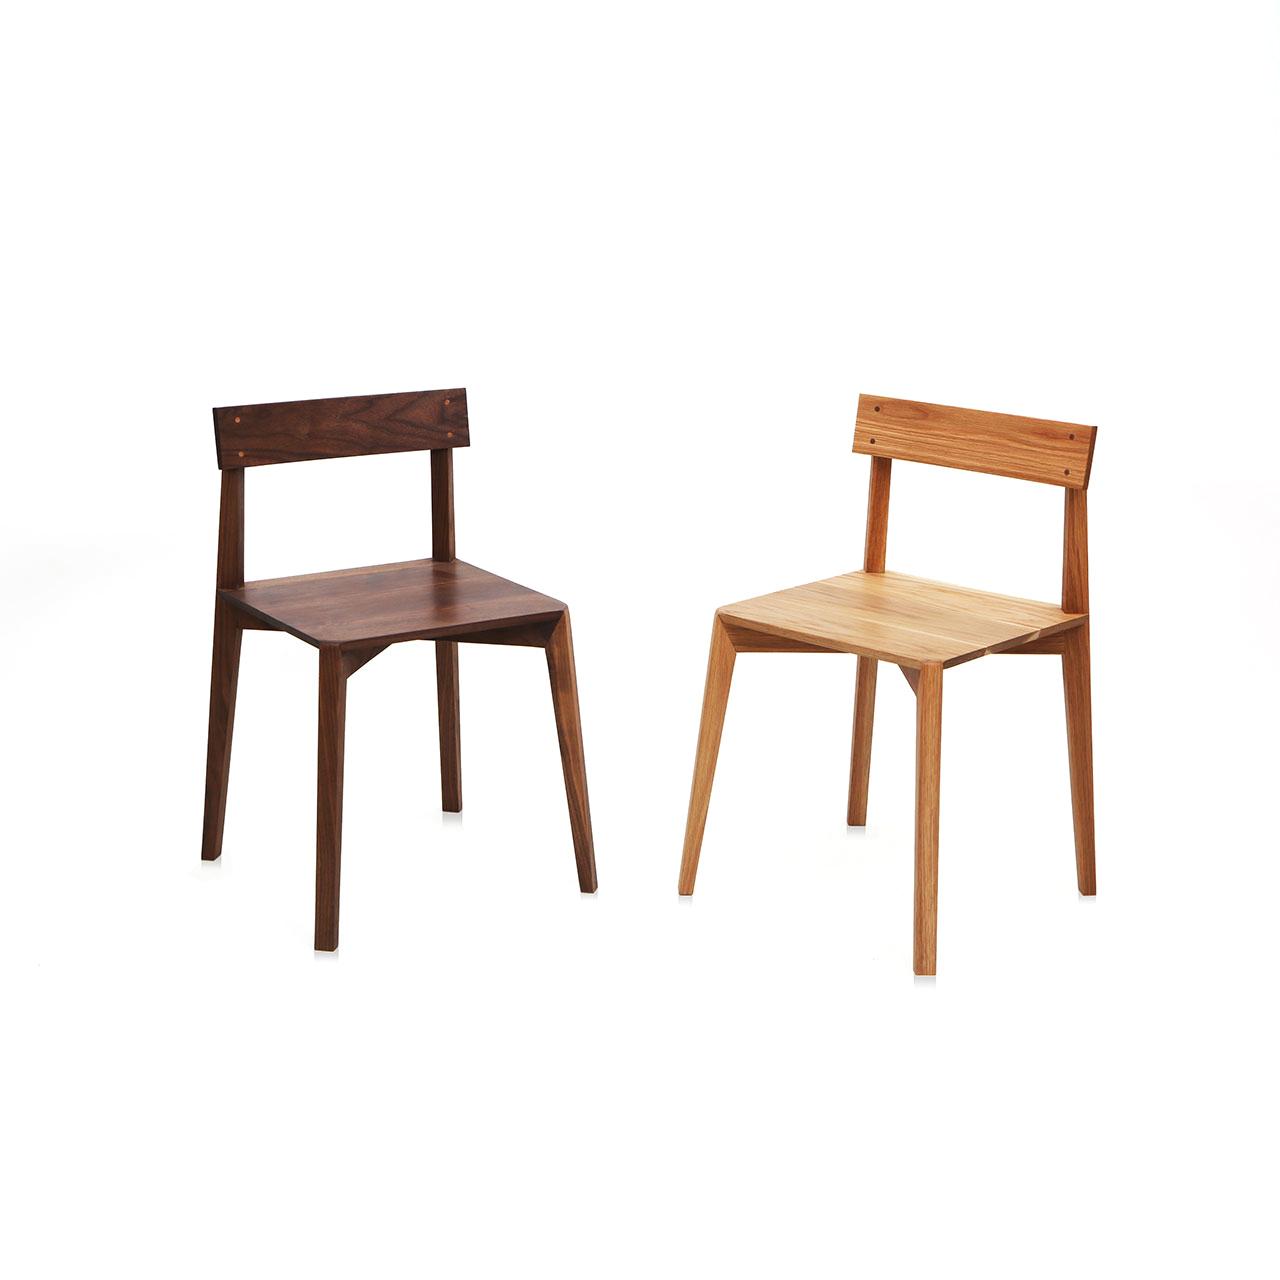 MEZZANINE/Chair 2.0